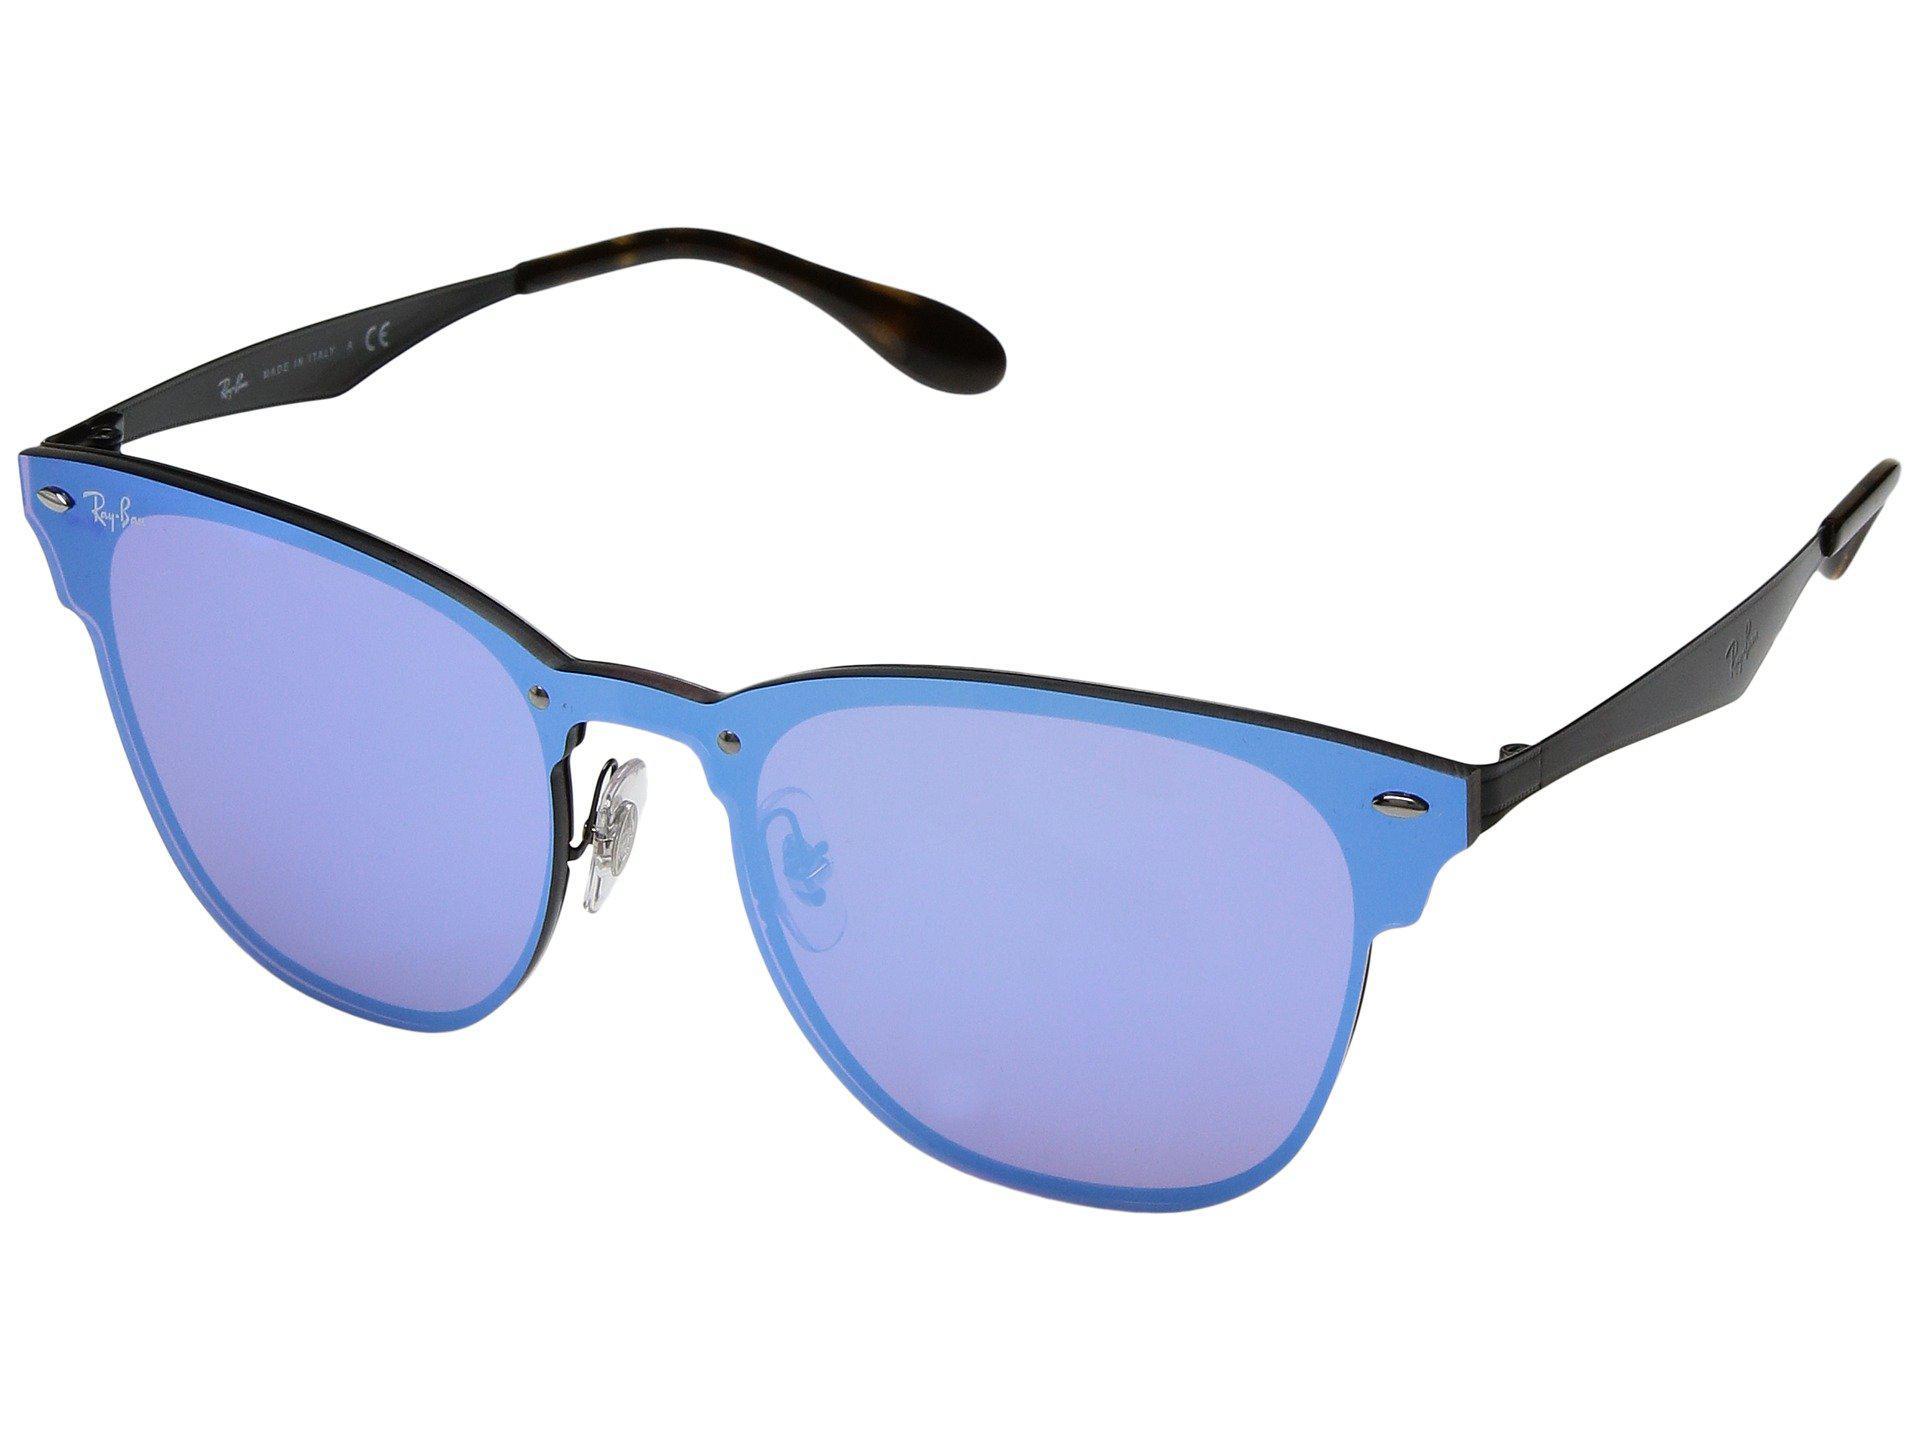 e9322cbb4fdf3 Ray-Ban Blaze Clubmaster Rb3576n 47mm (black dark Blue Mirror ...